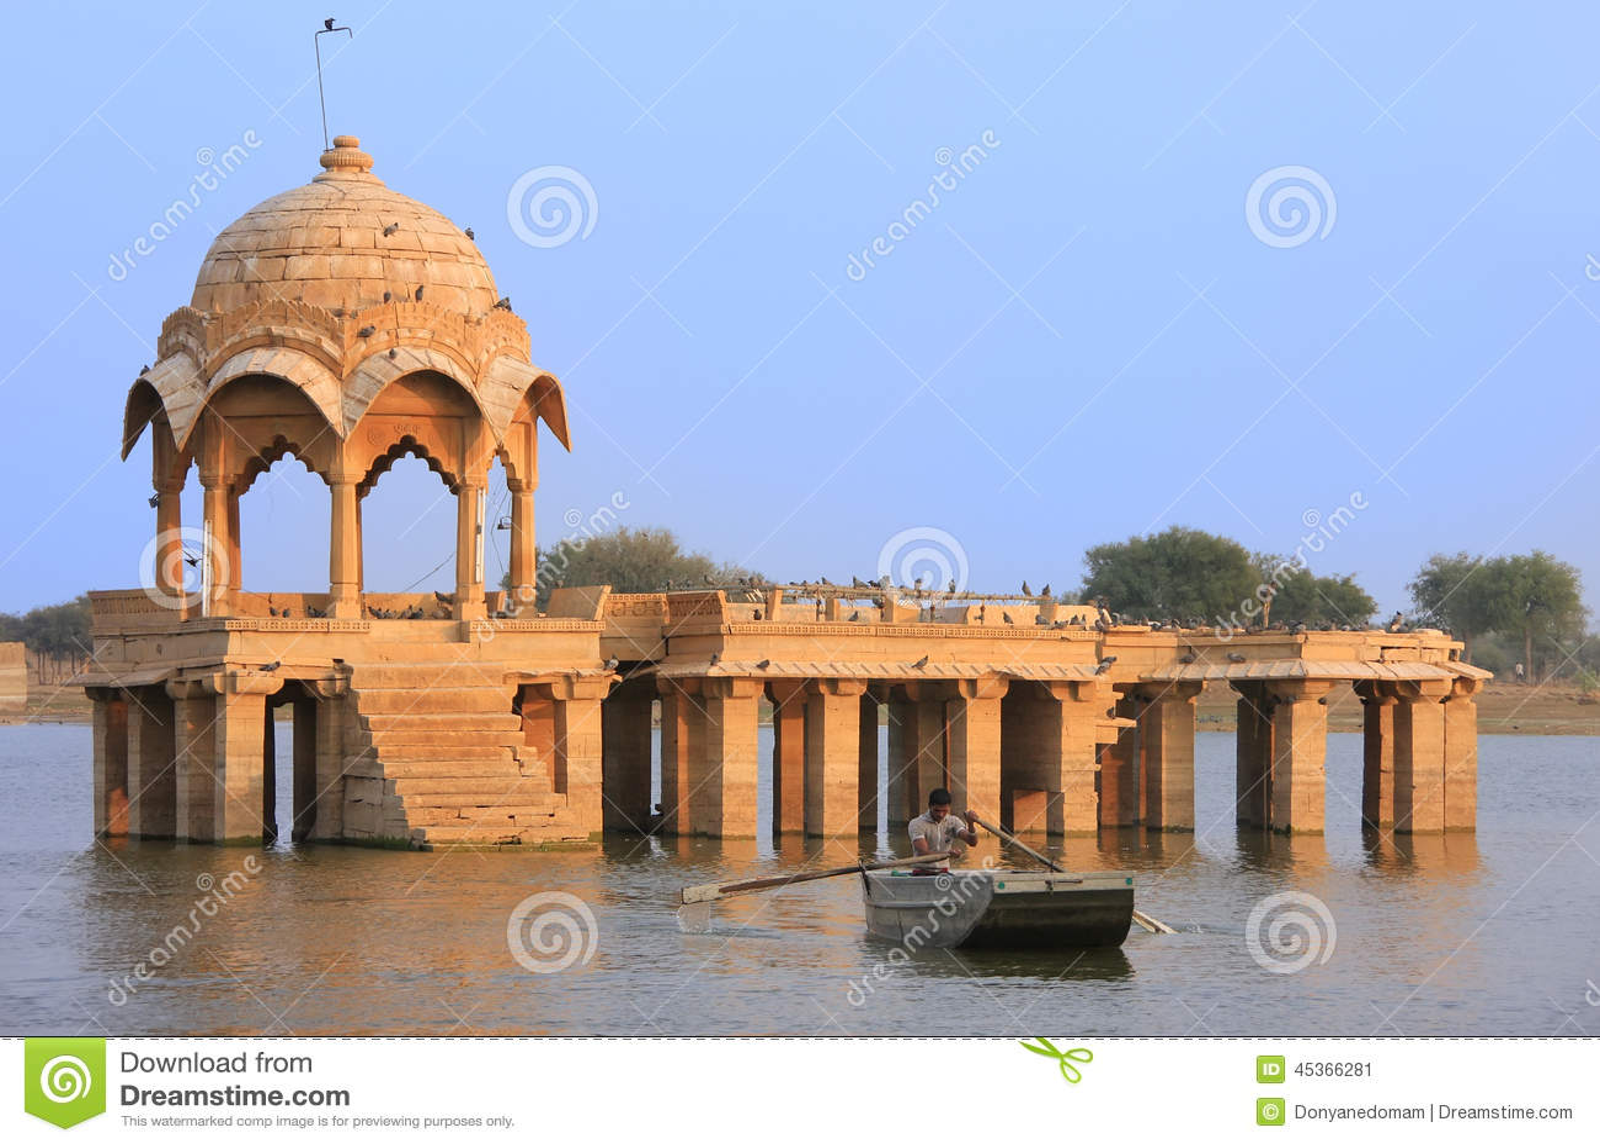 Temple de Gadi Sagar au lac Gadisar, Jaisalmer, Inde